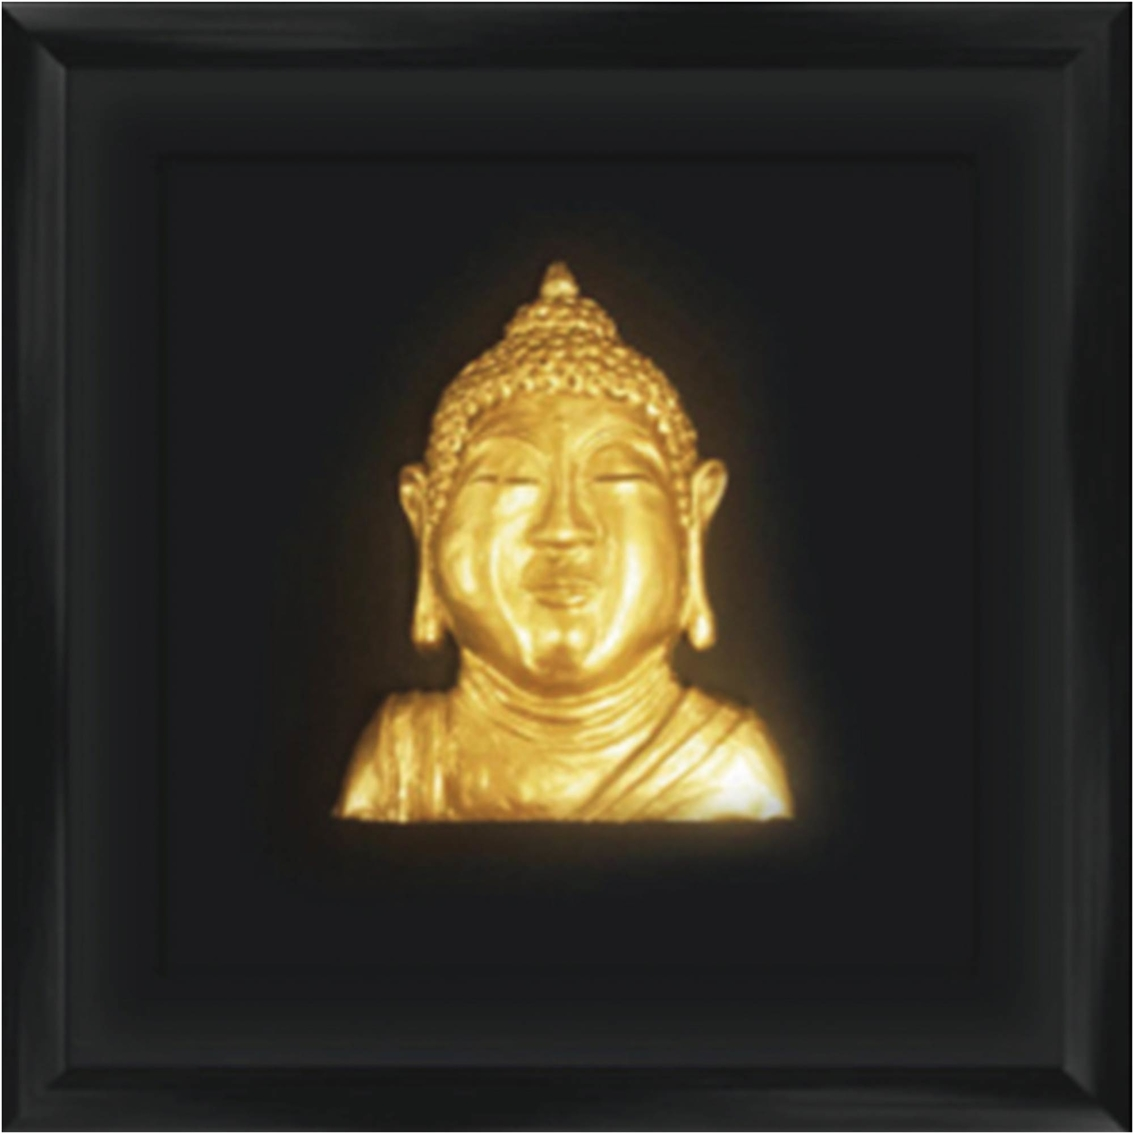 Golden Buddha Head Wall Art | Figures & People | Home & Appliances ...